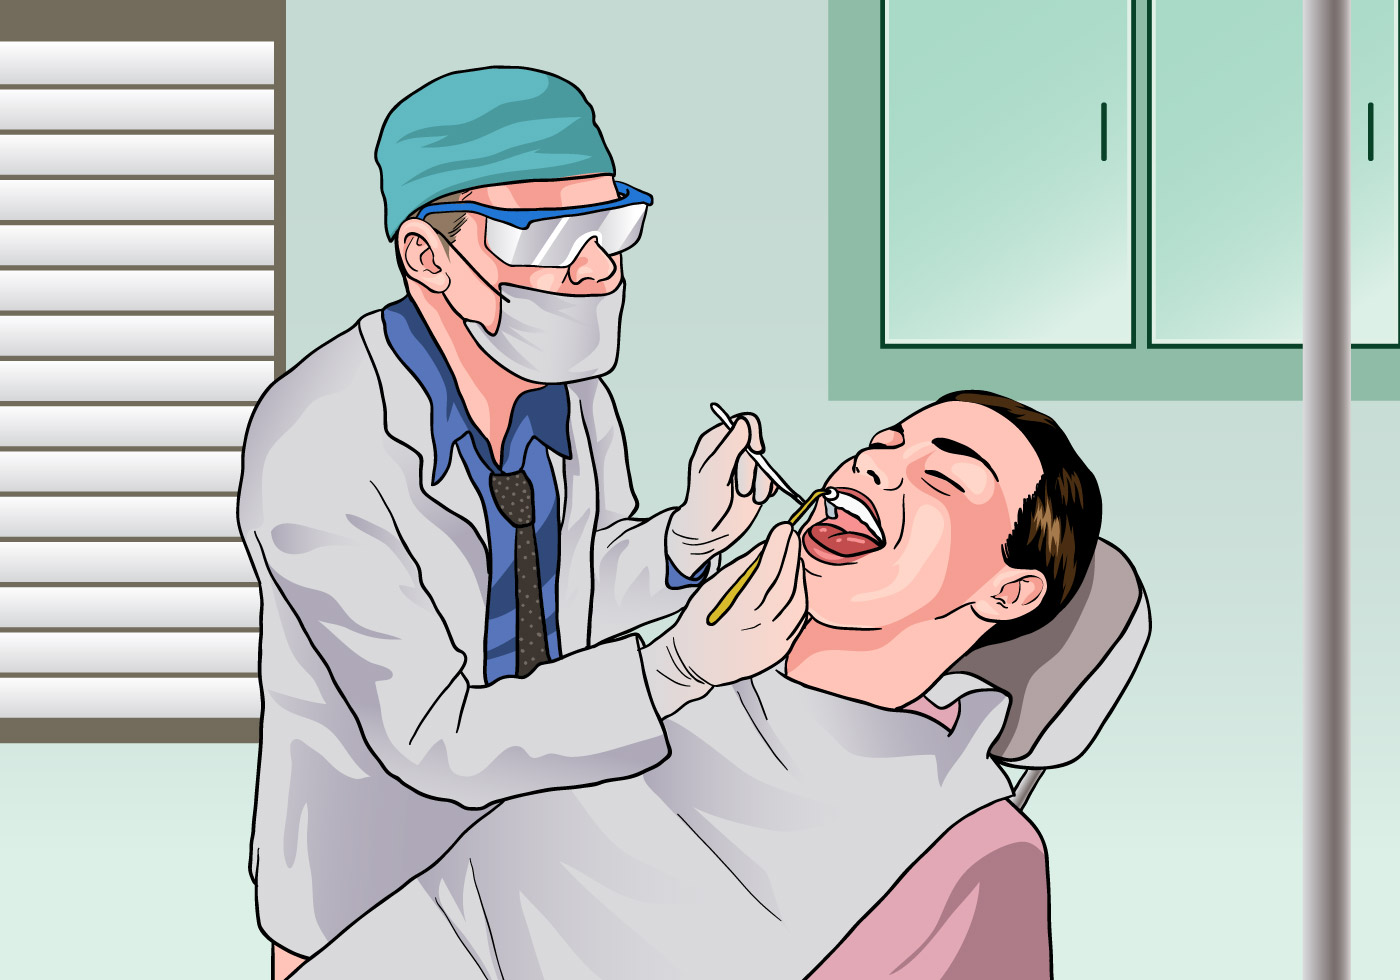 Dentista Examining A Patient Download Free Vector Art